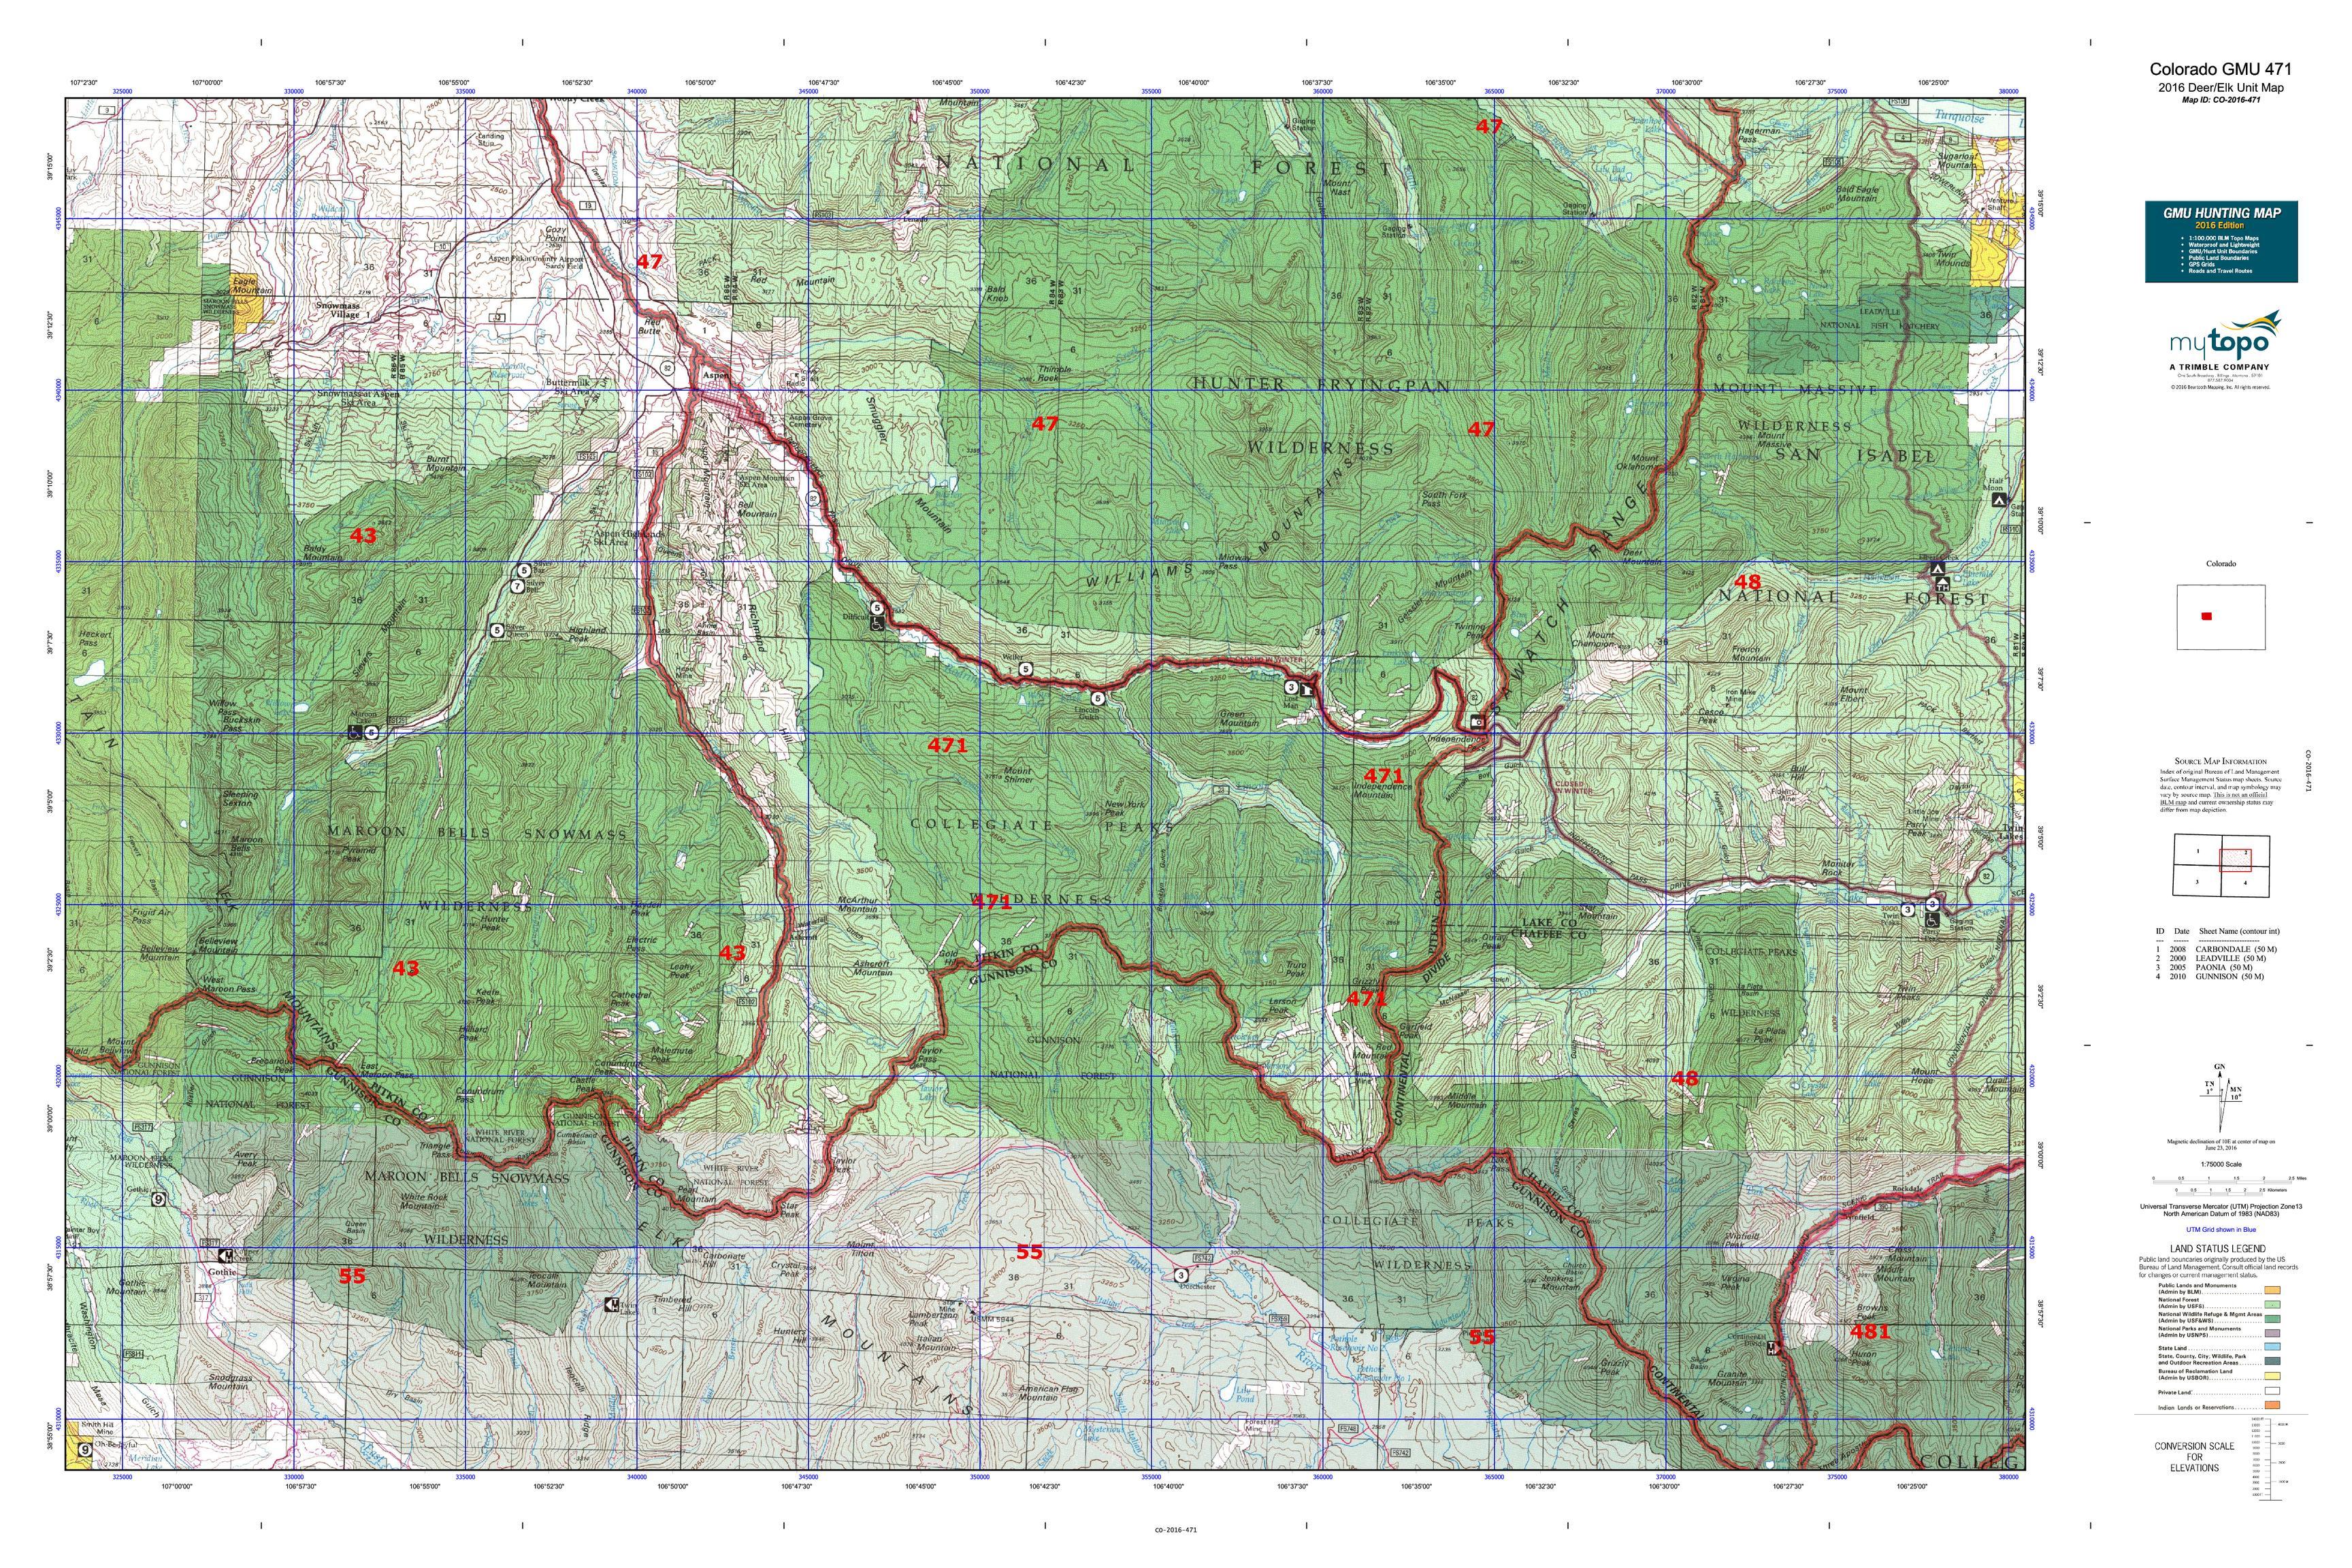 Colorado GMU 471 Map  MyTopo